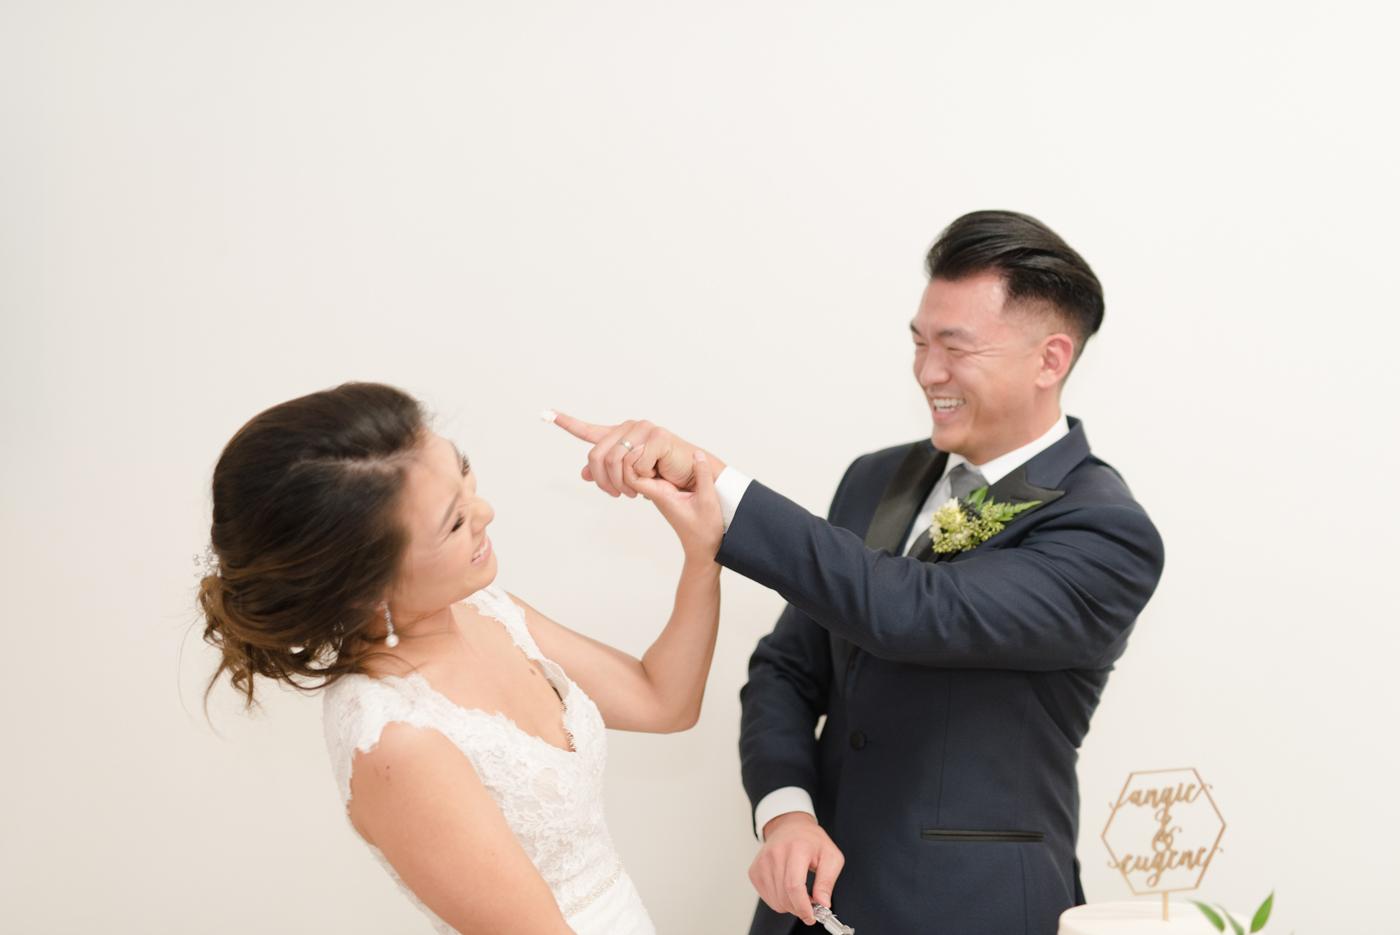 Modern_Wedding_HNYPT_Honeypot_LA_Photographer_Los_Angeles-58.jpg